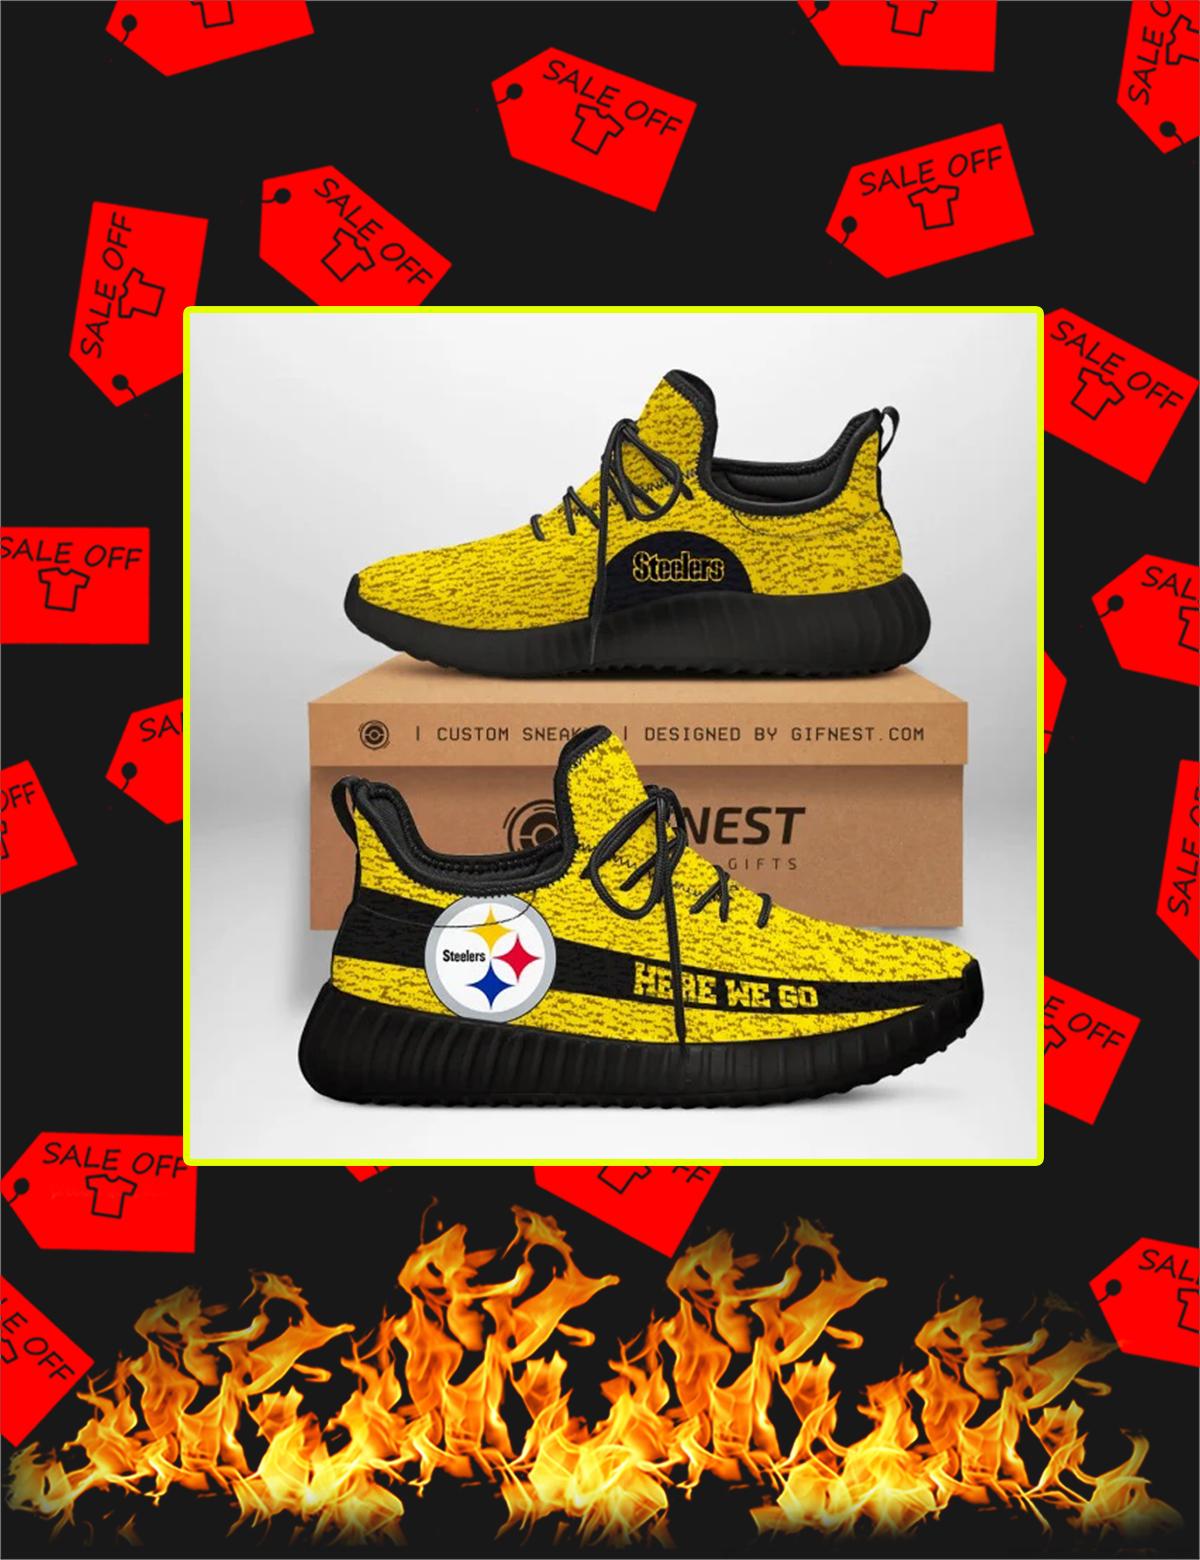 Pittsburgh Steelers NFL Yeezy Sneaker - Picture 1